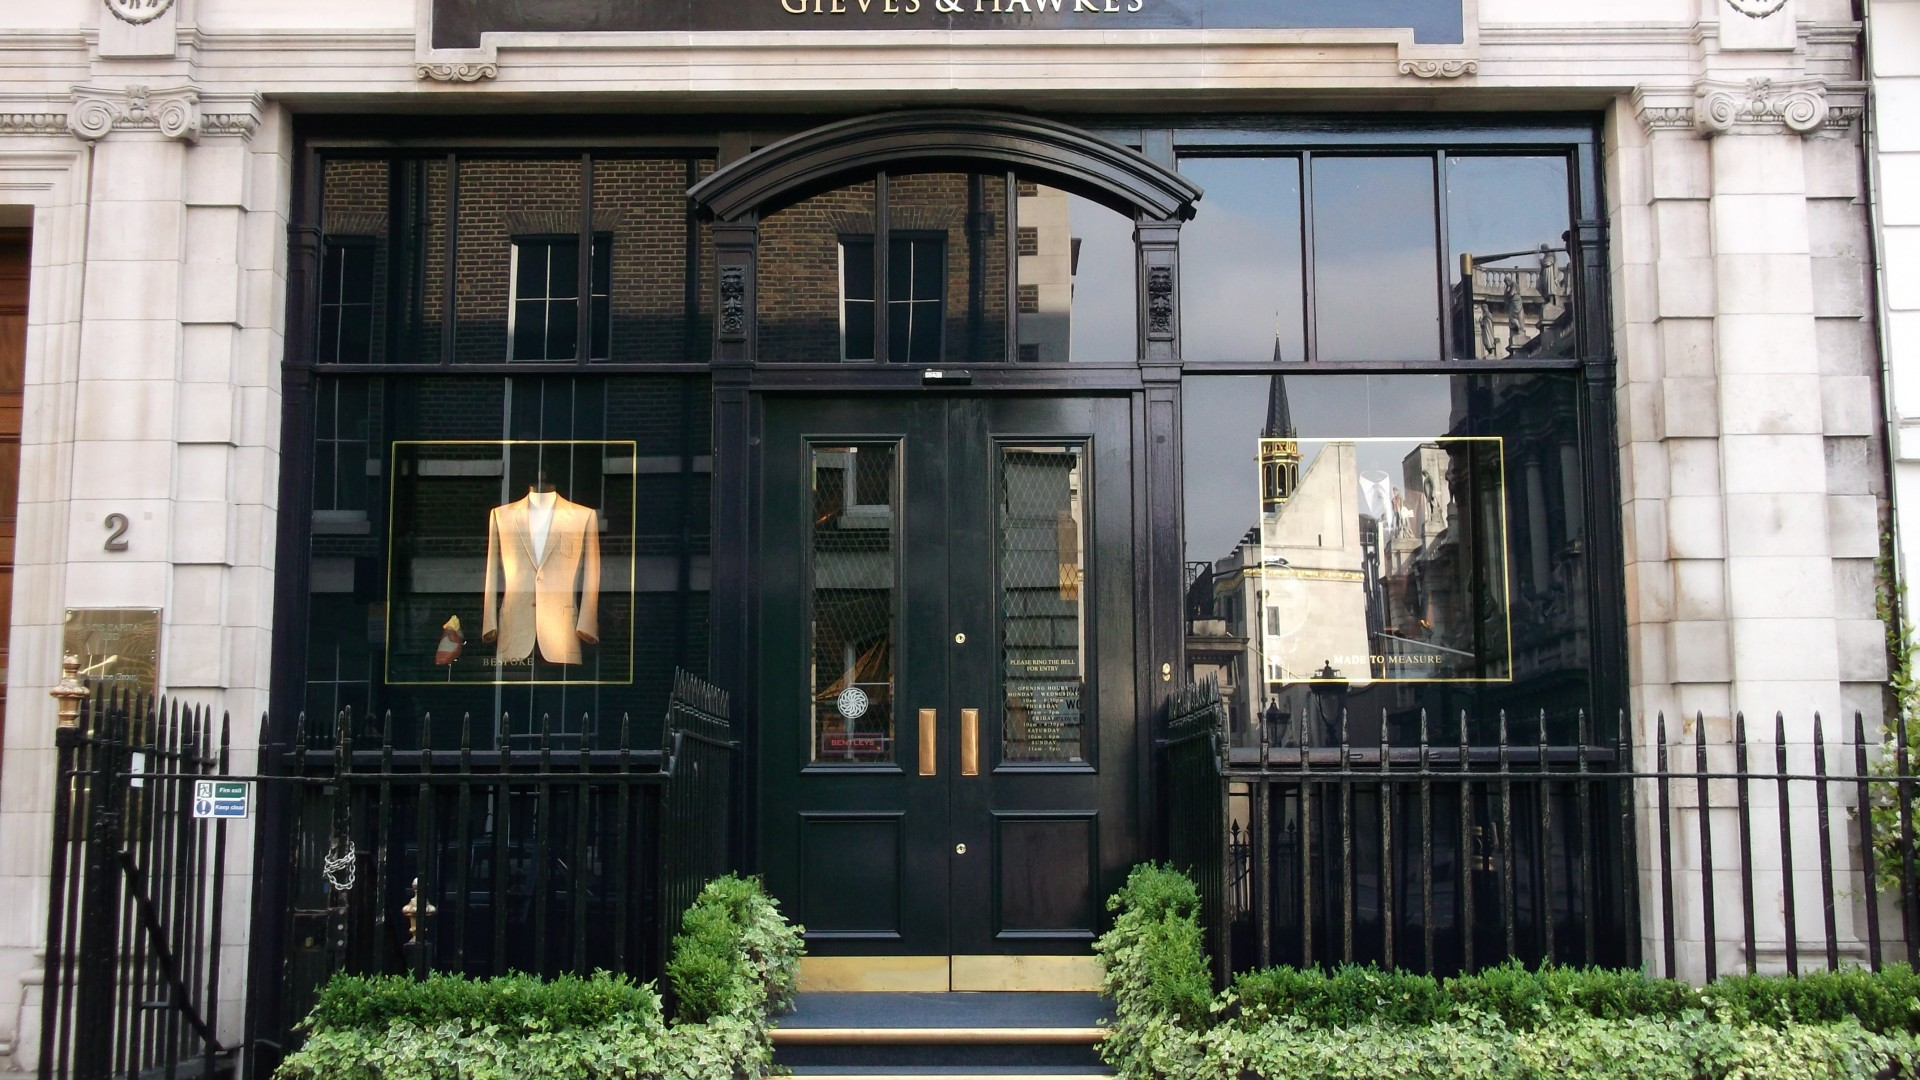 Gieves & Hawkes, 1 Savile Row, W1S 3JR